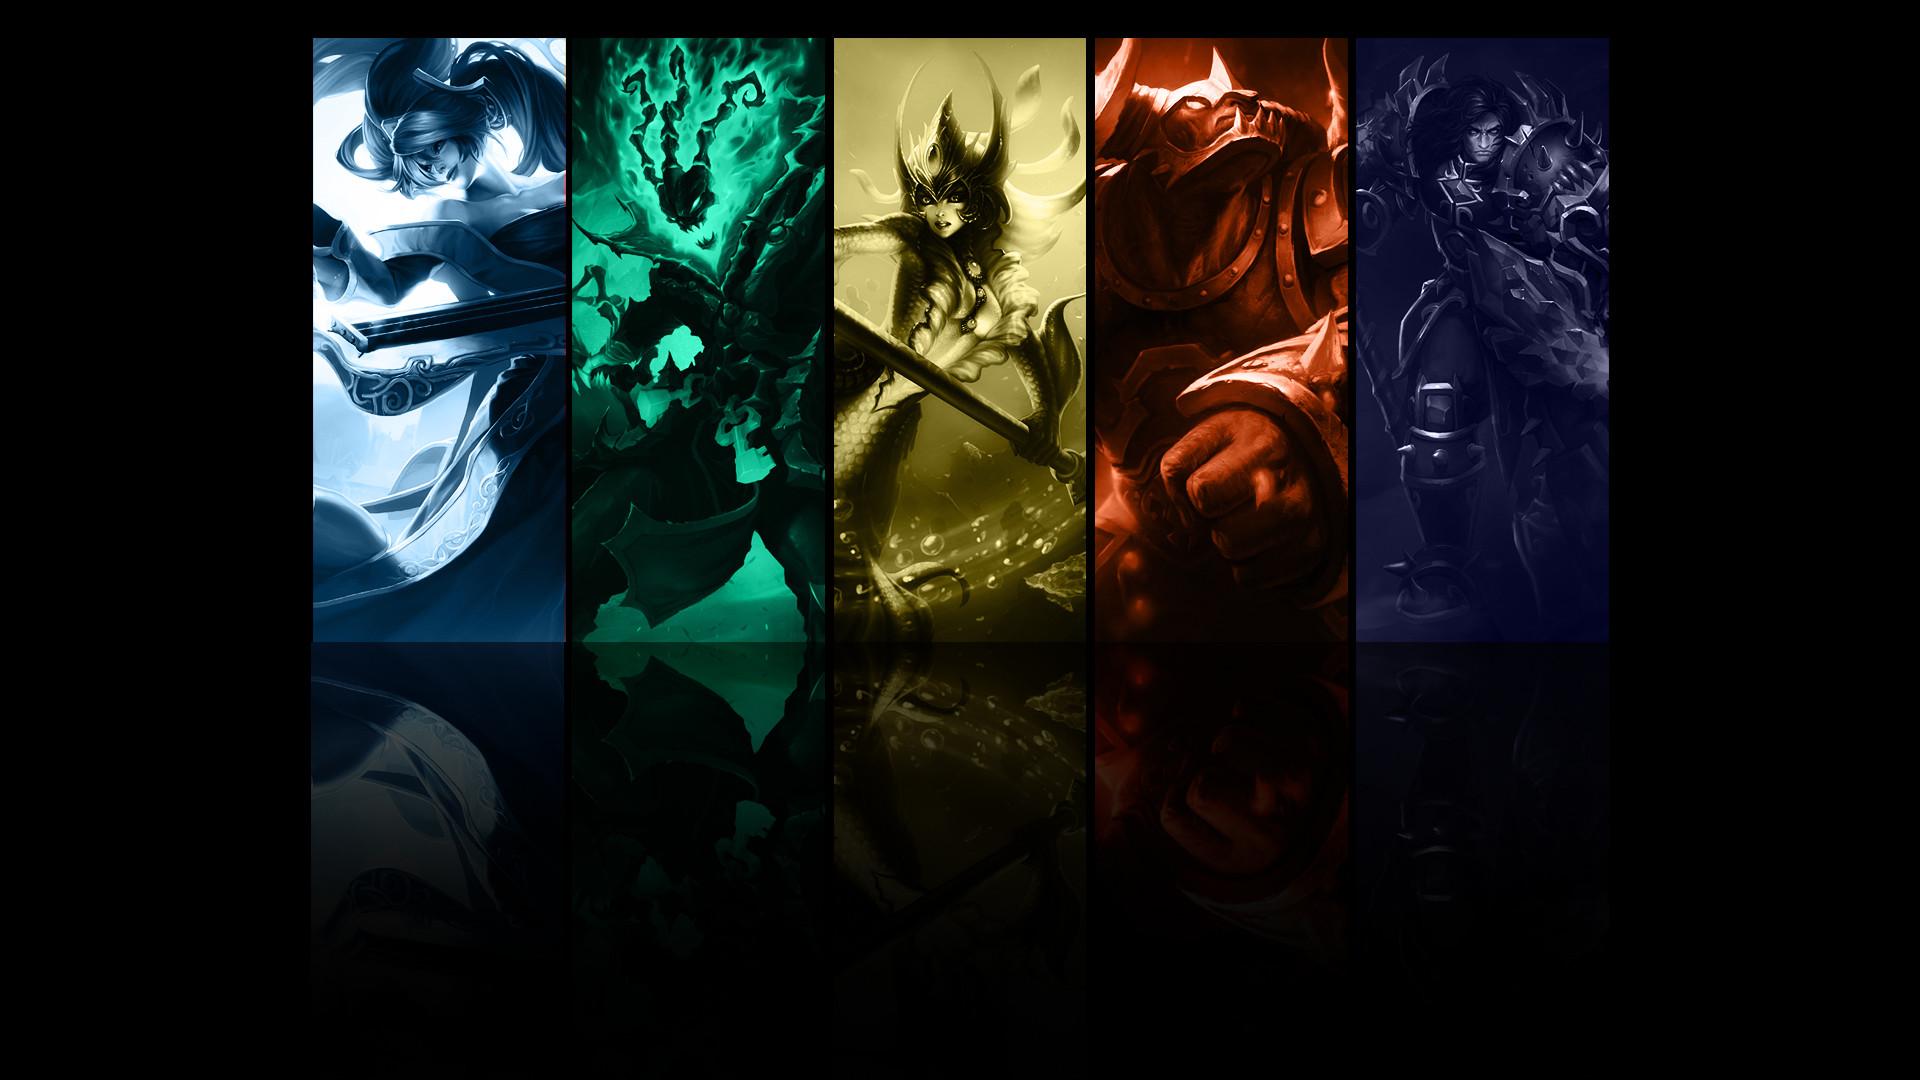 League Of Legends Support League Of Legends Support Wallpaper .